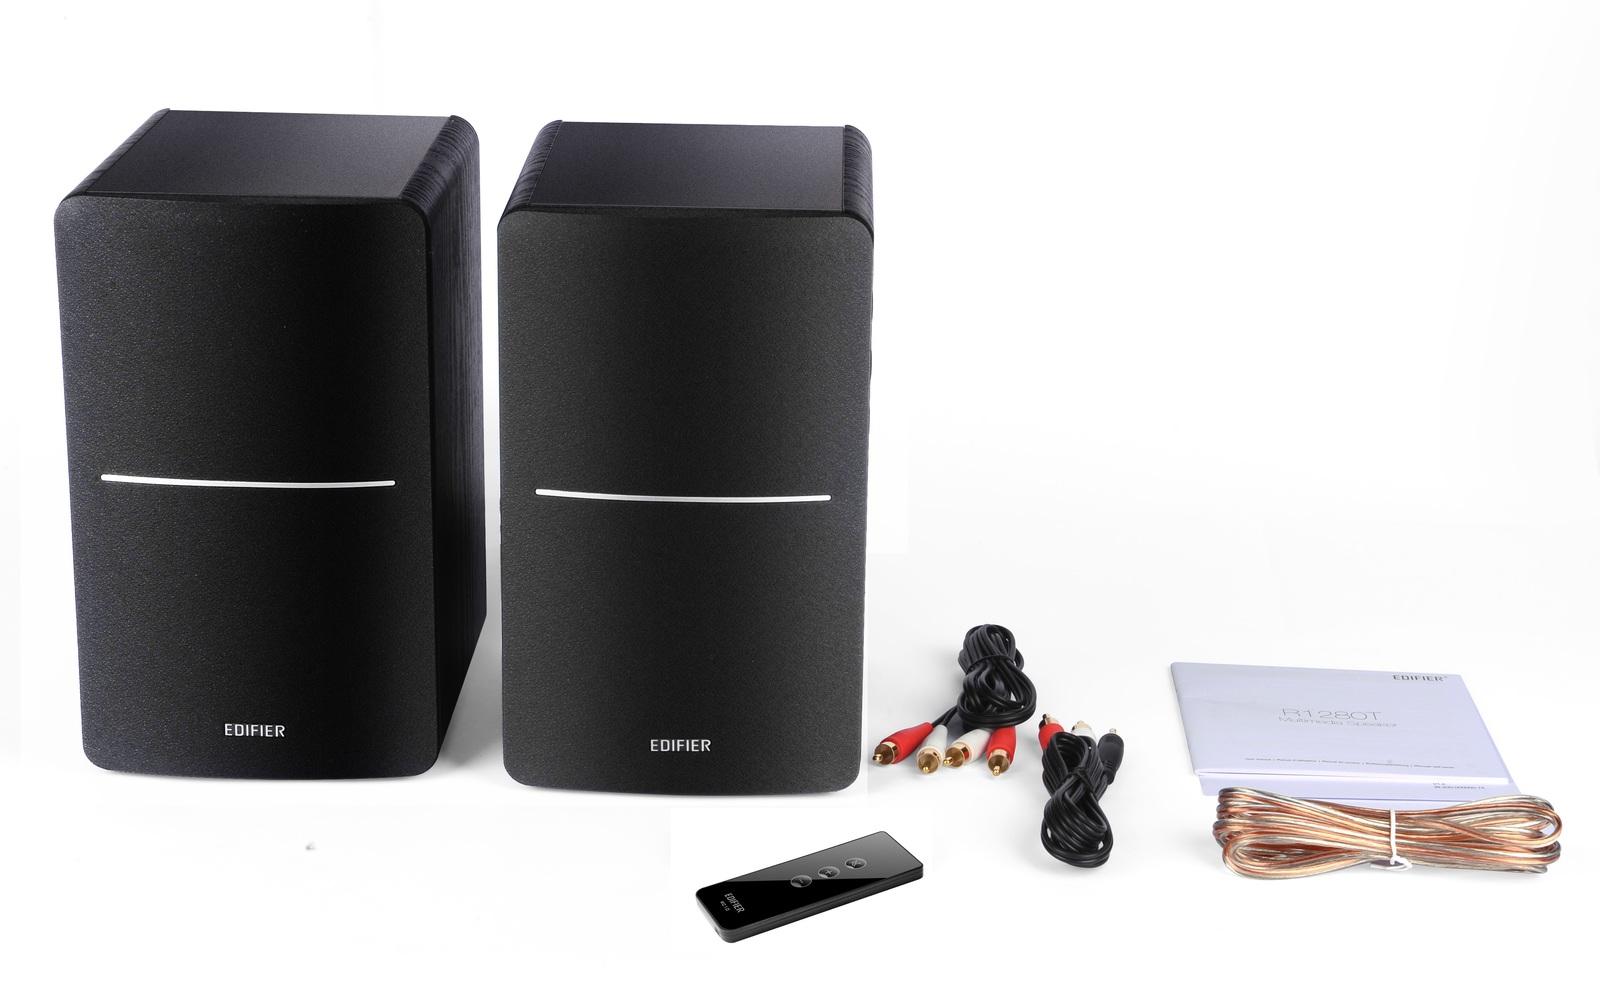 Edifier R1280T 2.0 Lifestyle Speakers (Black) image